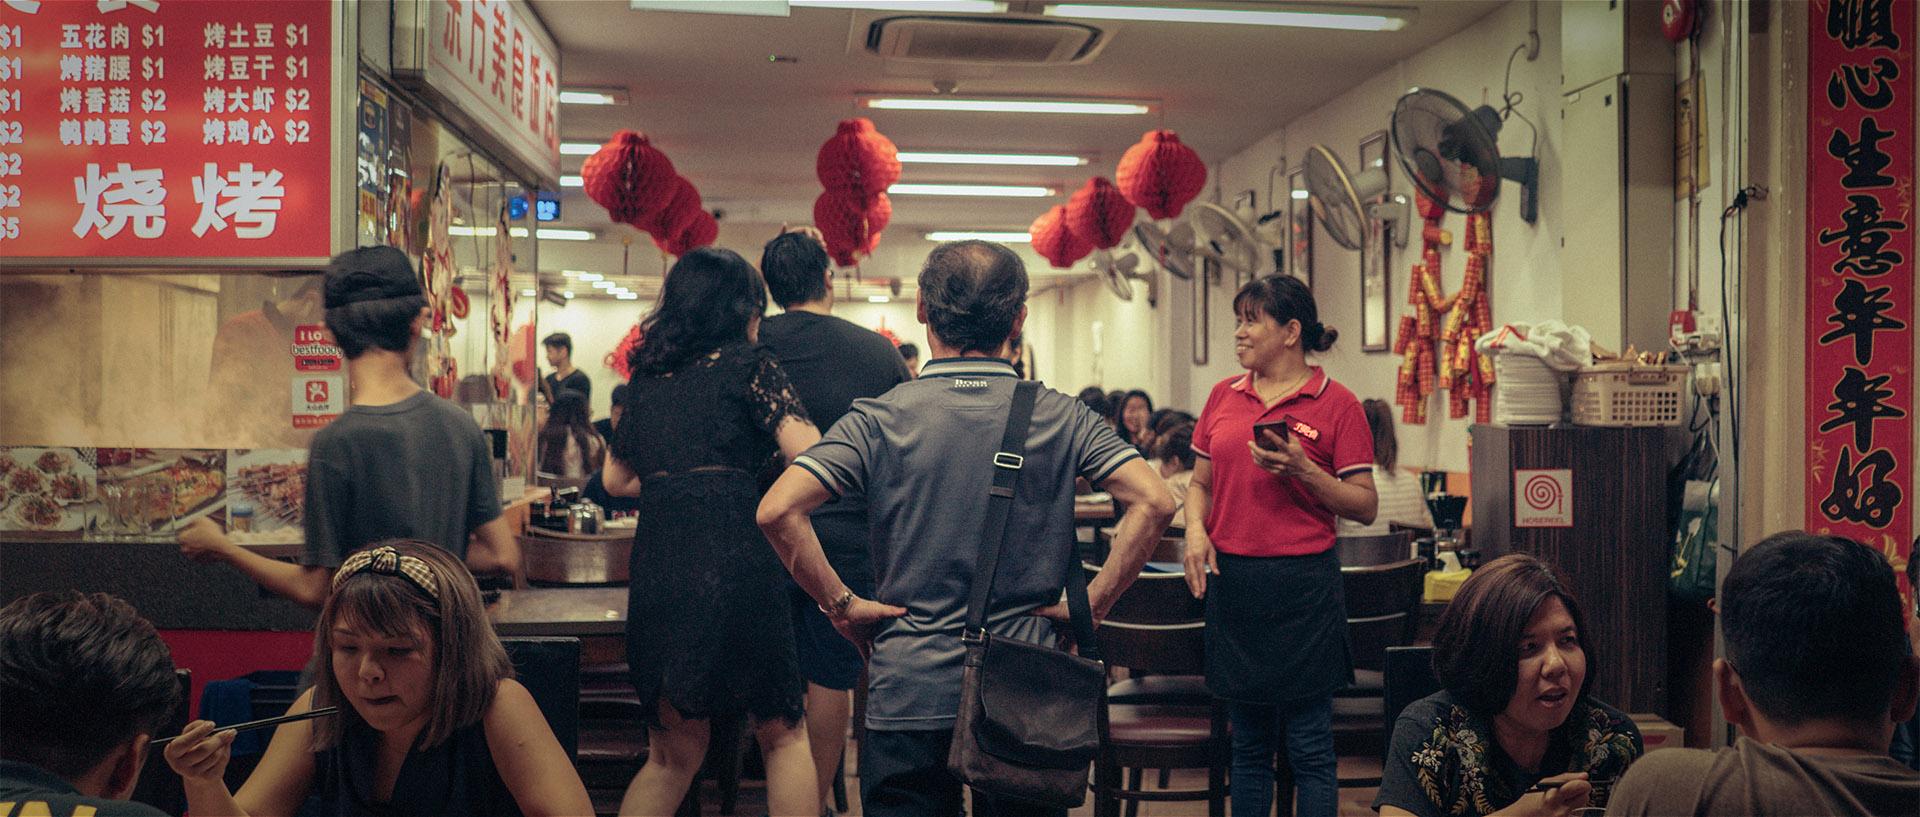 Nikko Pascua Travel photography Singapore_09142.jpg